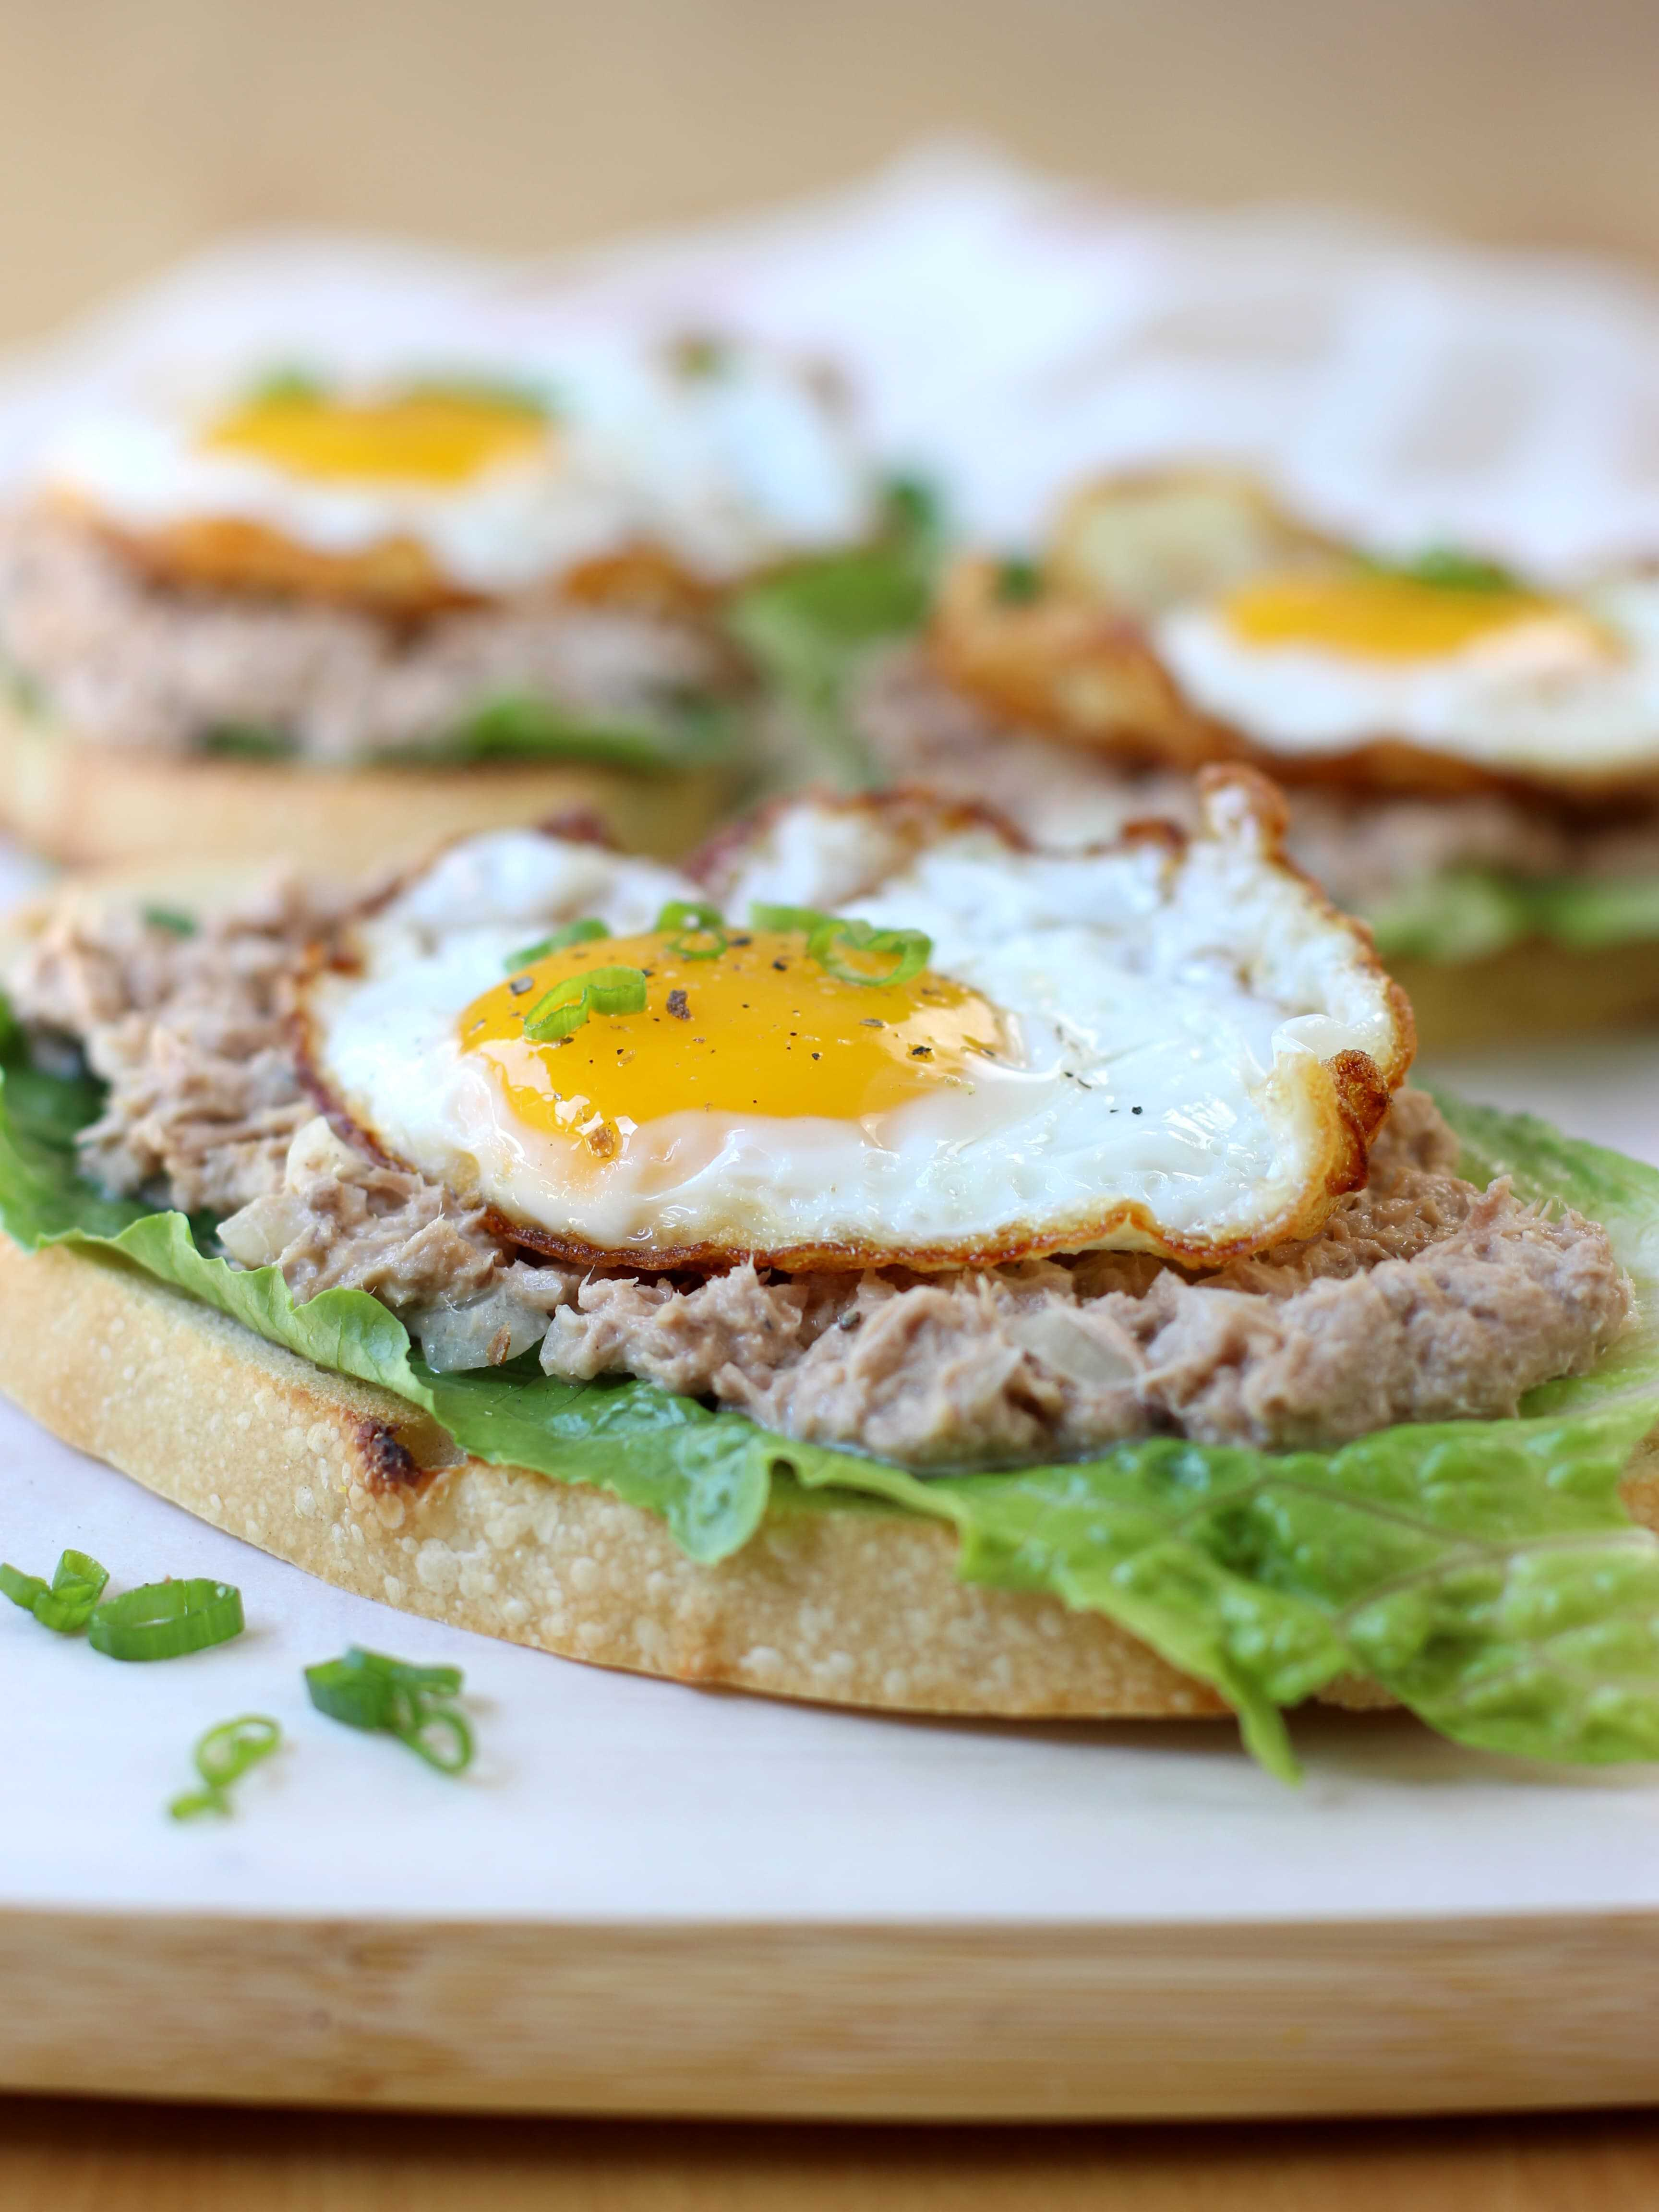 Open Face Tuna and Egg Sandwich